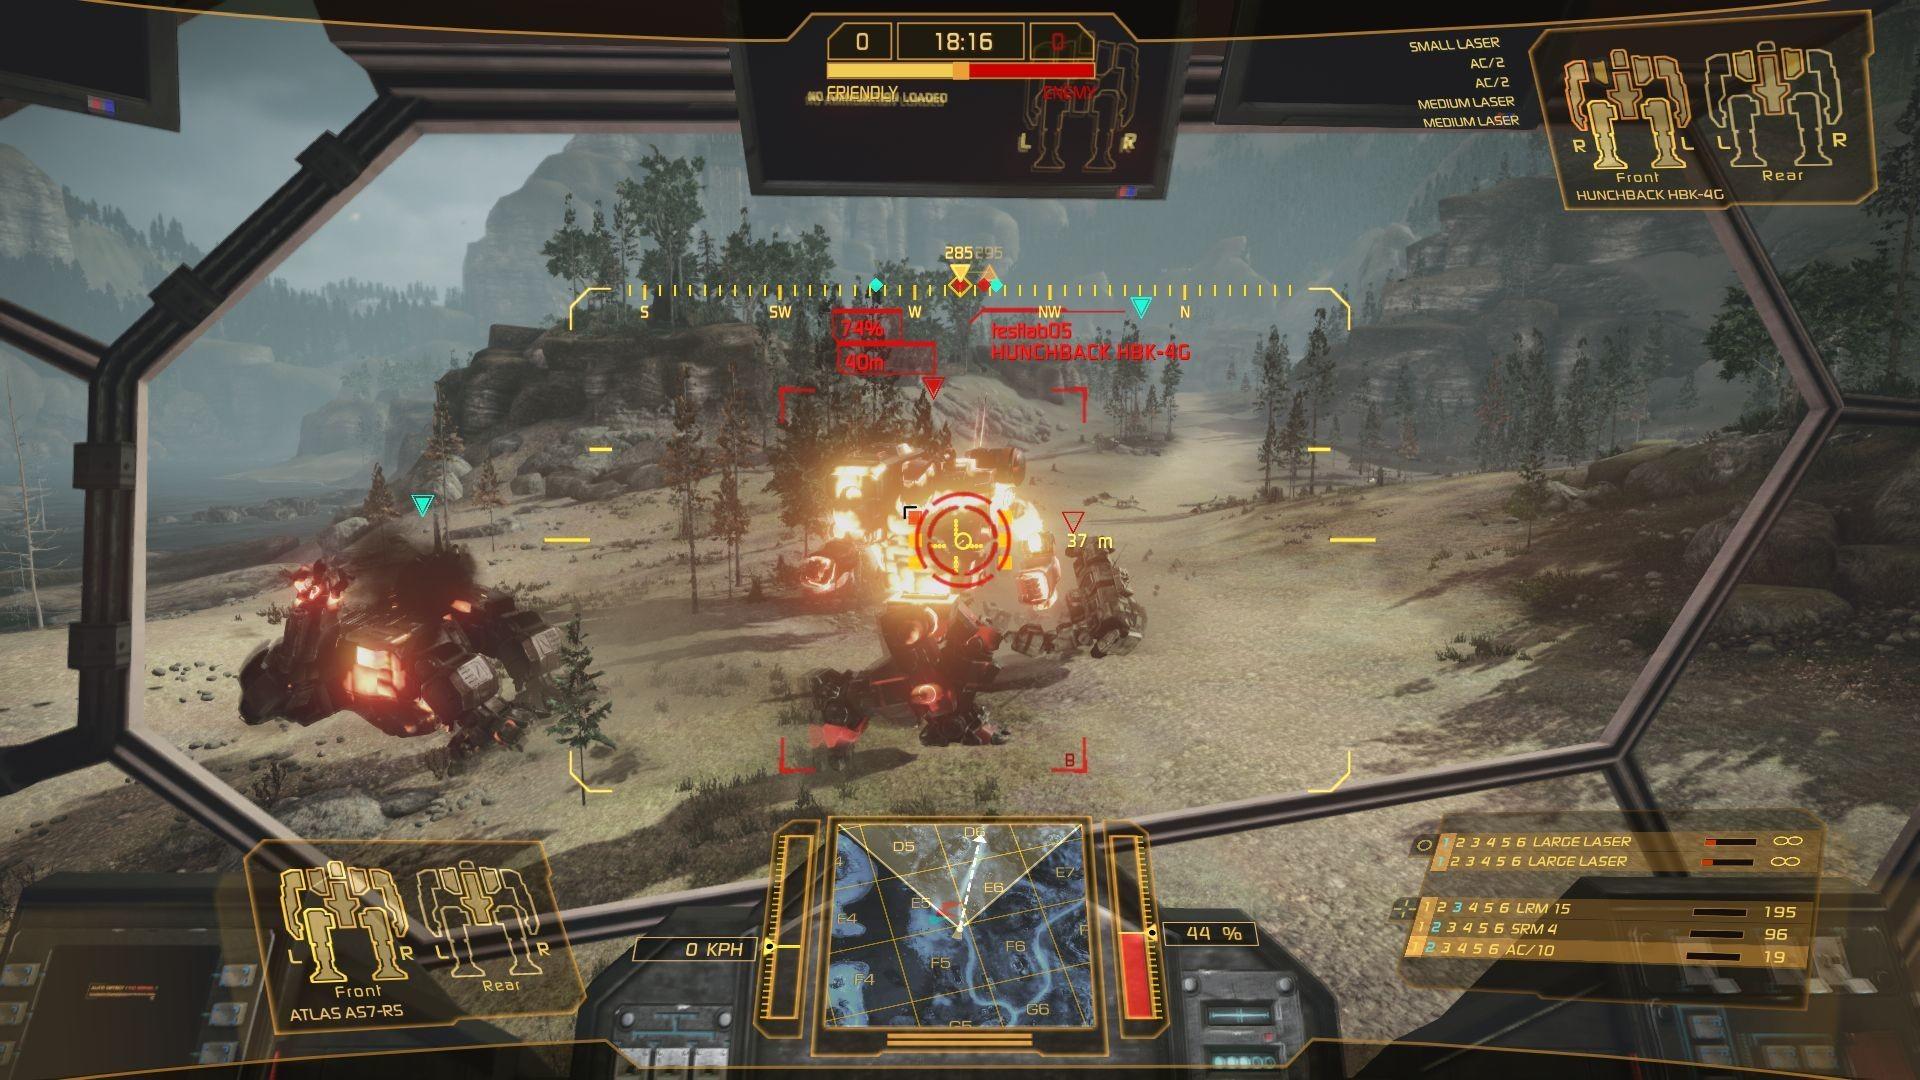 MechWarrior Online celebrates Steam launch with $100K esports championship  | GamesBeat | Games | by Jeff Grubb